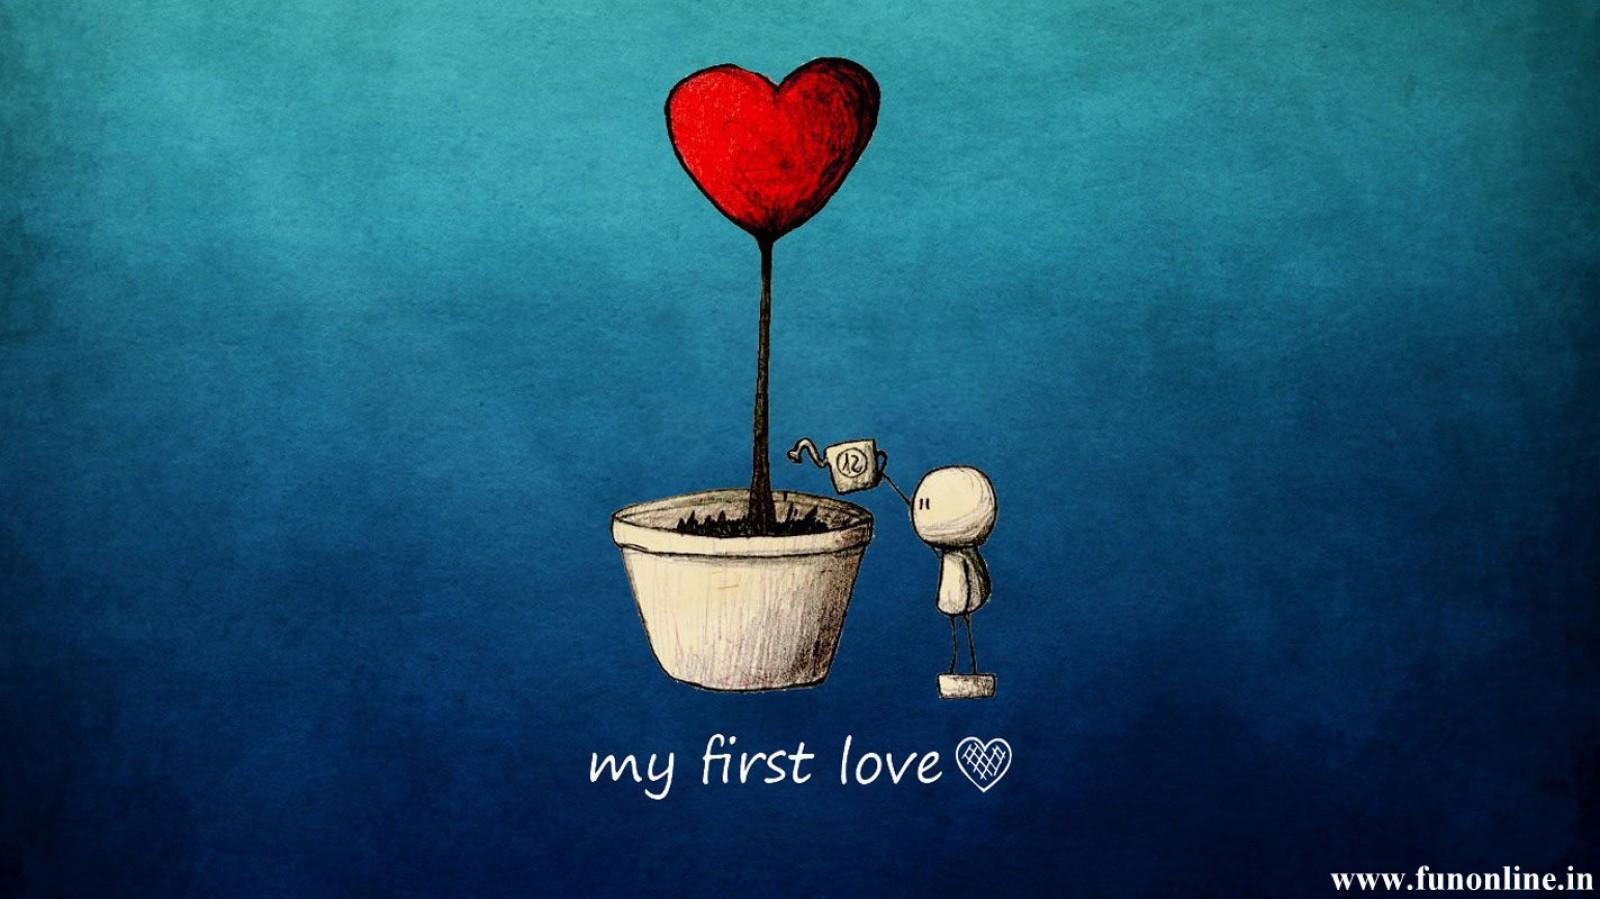 My First Cute Love Wallpaper 1600x899